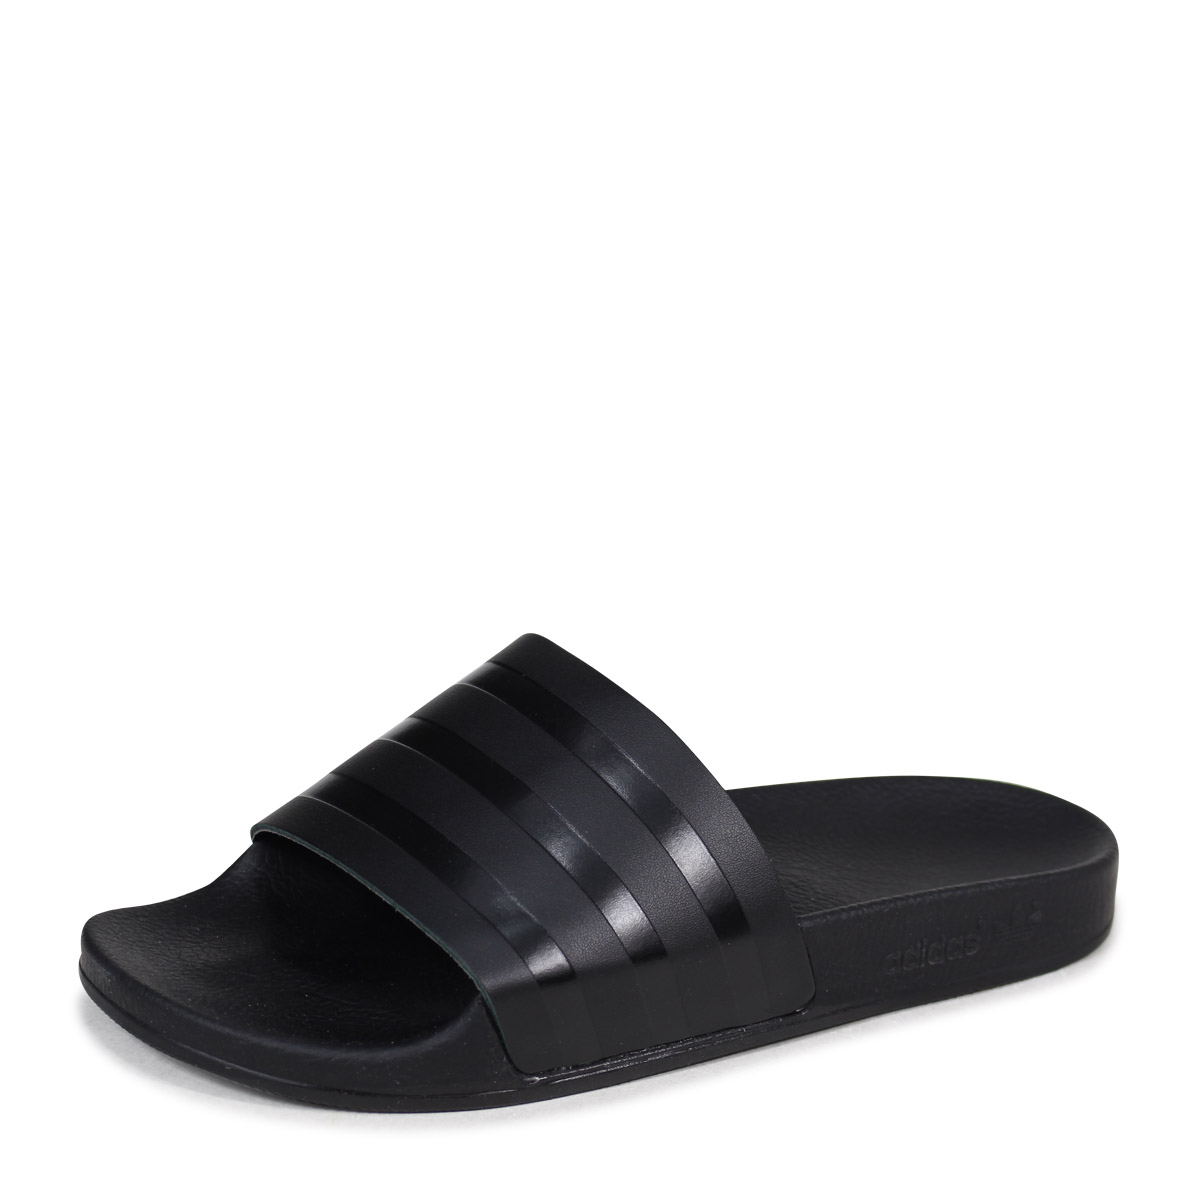 new style 84d64 d1491 アディダスアディレッタ adidas Originals sandals shower sandals ADILETTE SLIDES men CQ3094  black originals  4 19 Shinnyu load